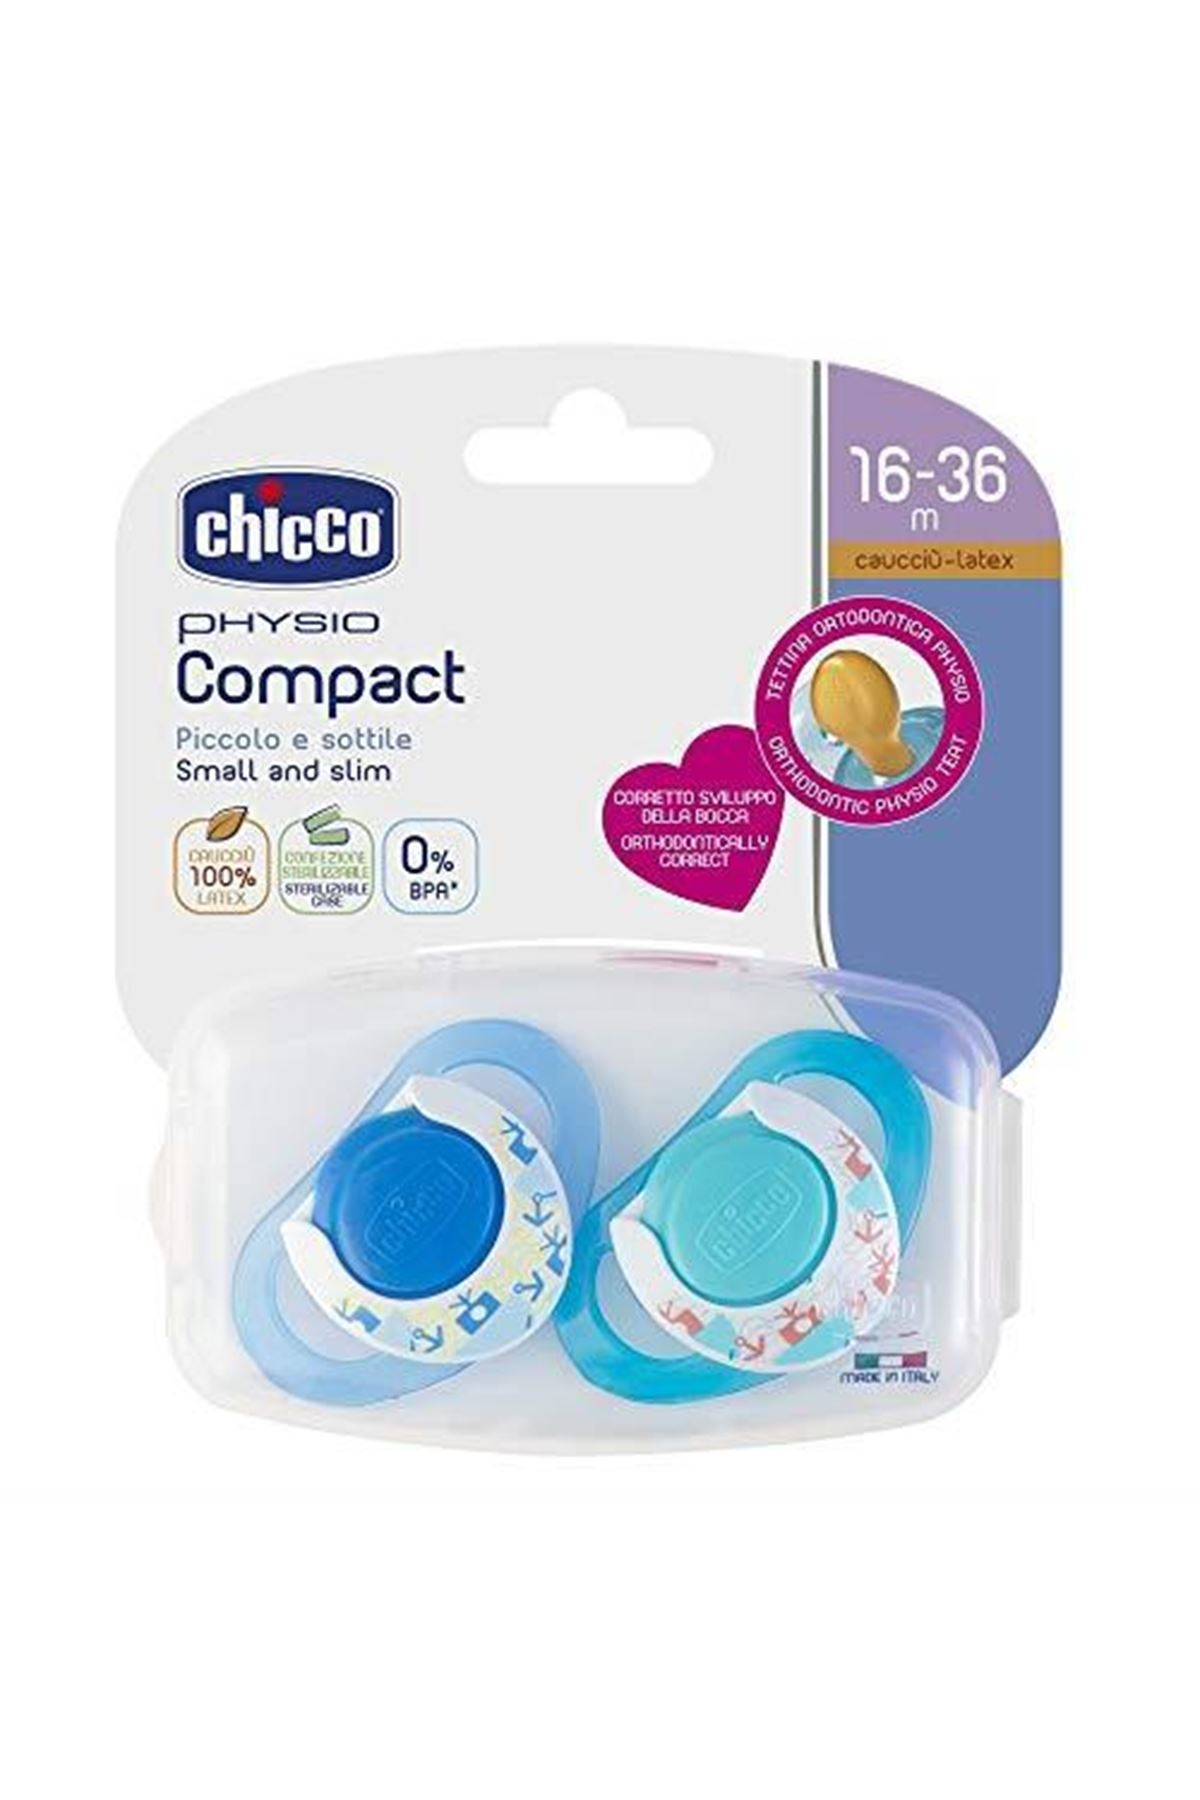 Chicco Physio Compact Kauçuk Emzik 16-36 Ay Erkek 2li